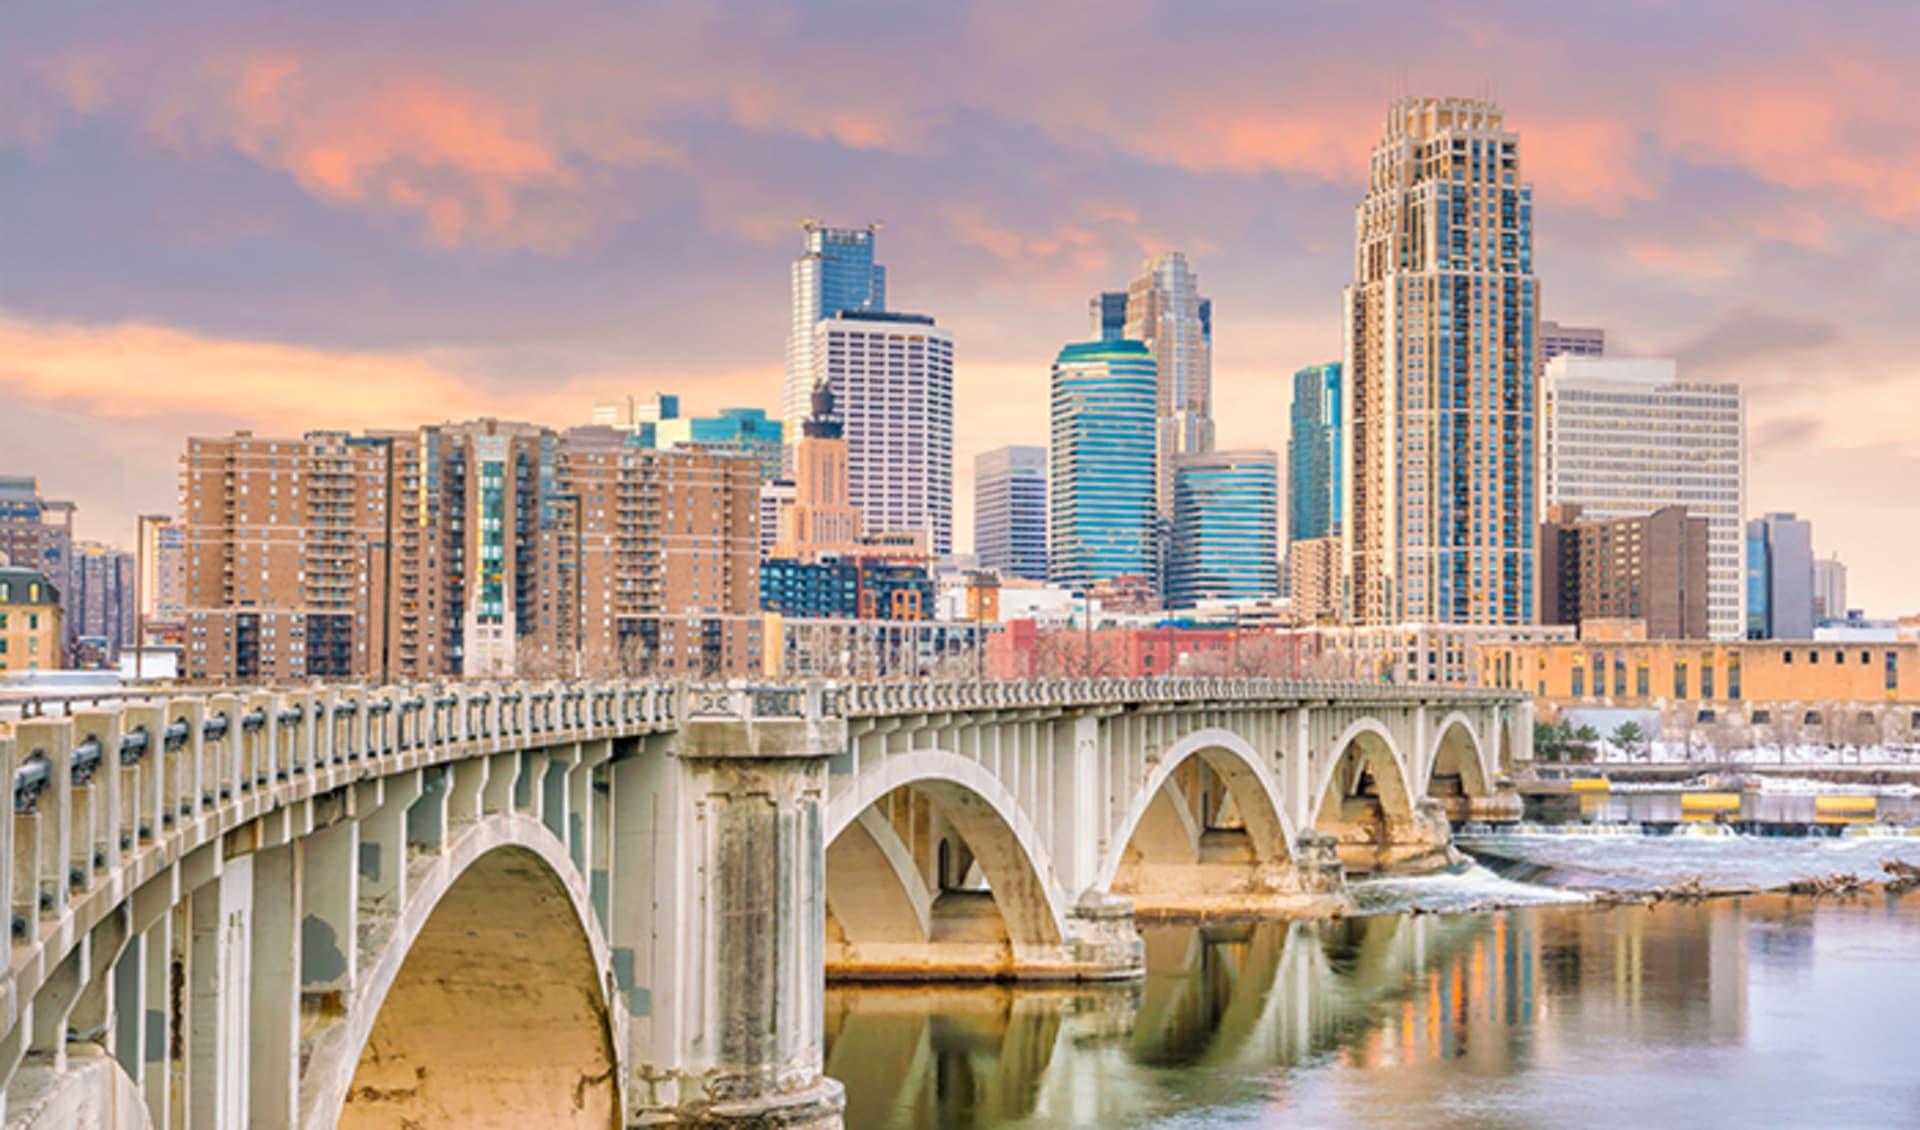 USA, Mittlerer Westen, Minneapolis